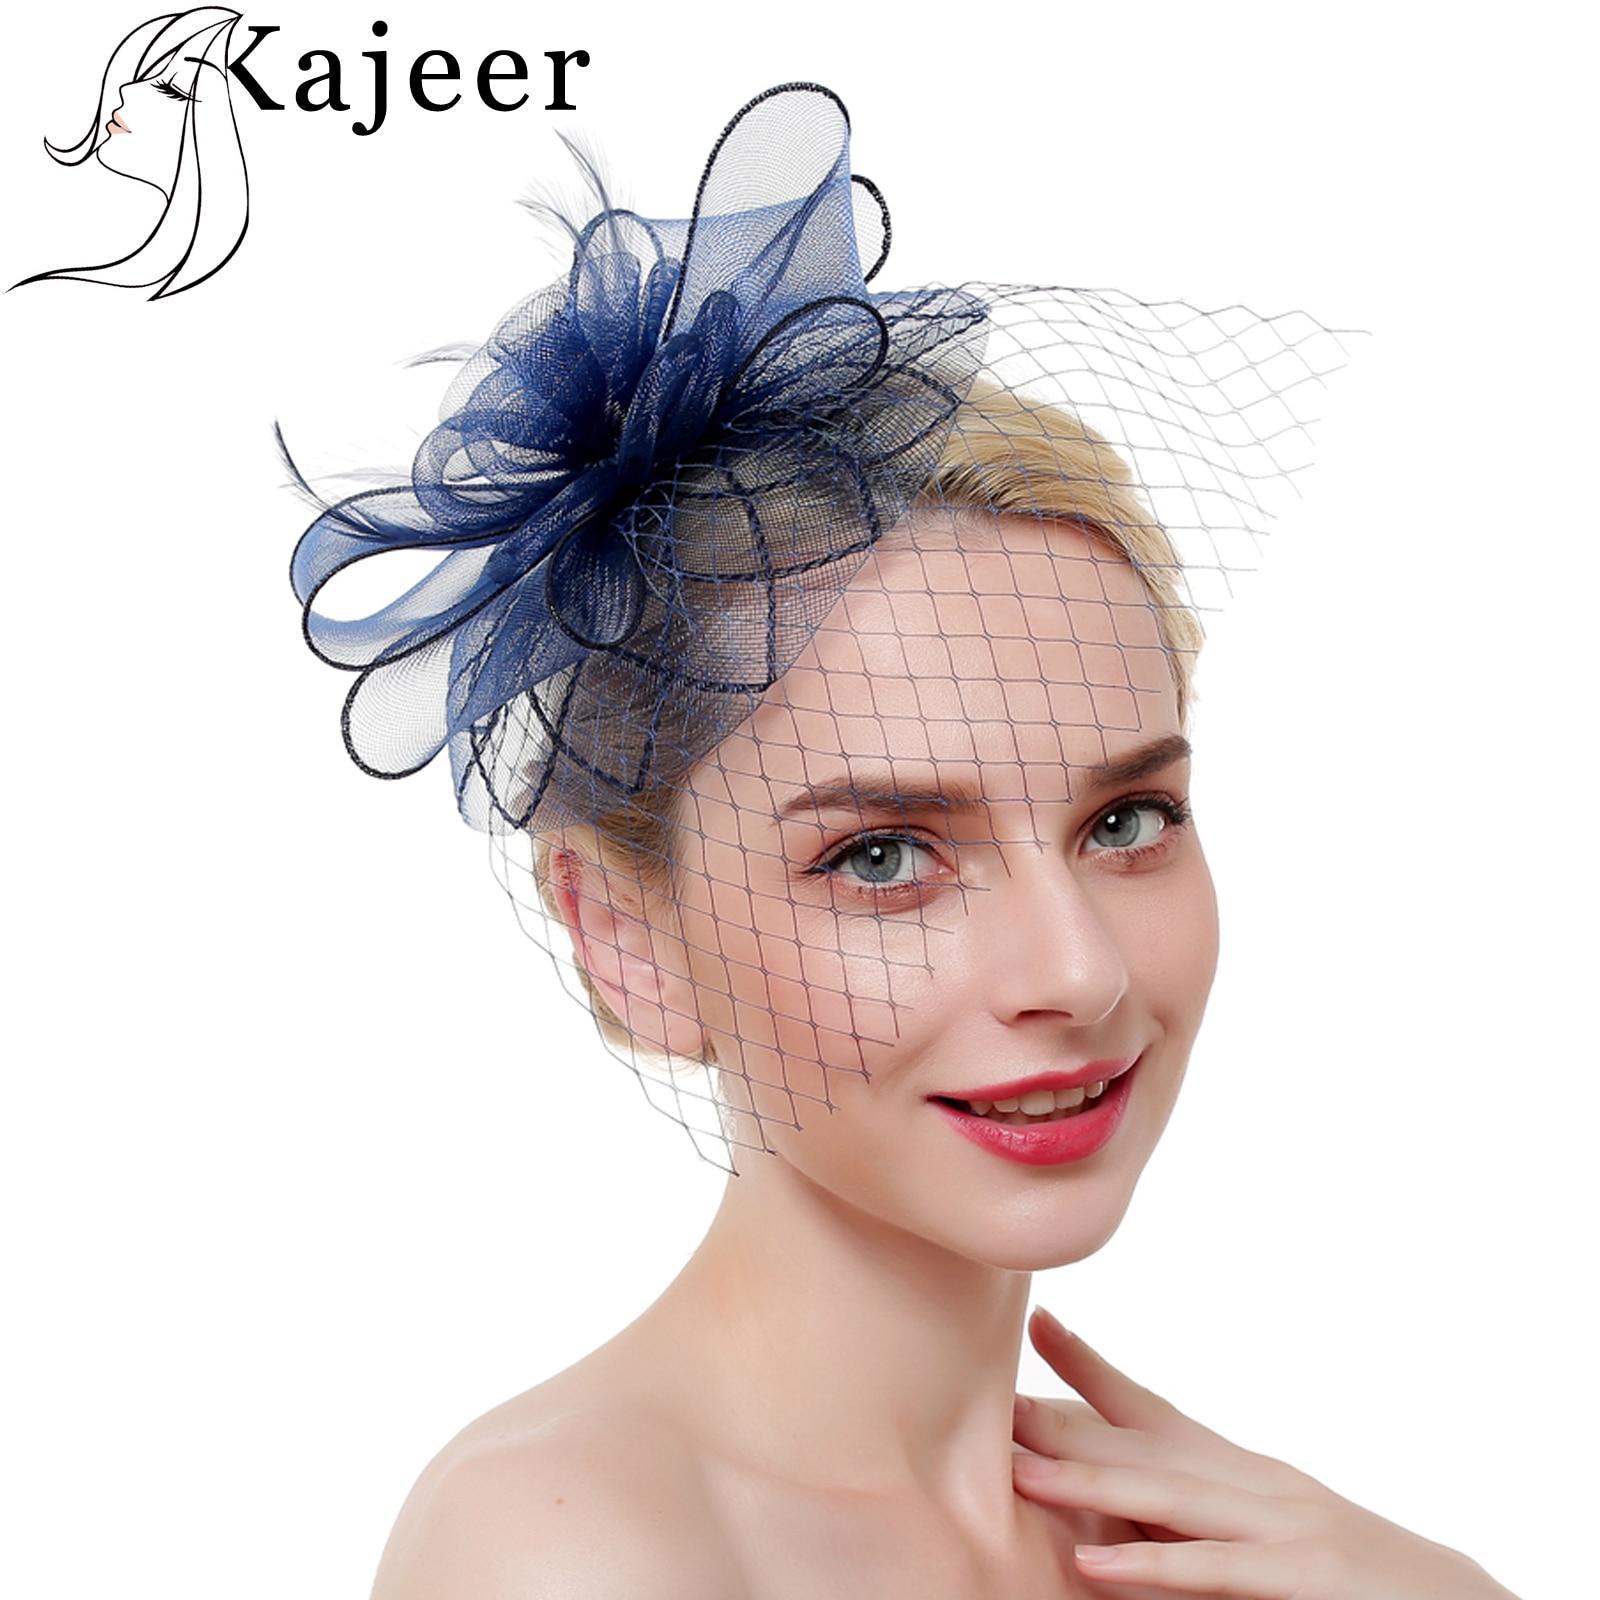 Kajeer Redes de Novo Estilo Mulheres Pena Hairwear Fascinator Chapéus Cavalo de Corrida Chapéus Festival Fechaduras de Cabelo Noiva Acessórios Para o Cabelo